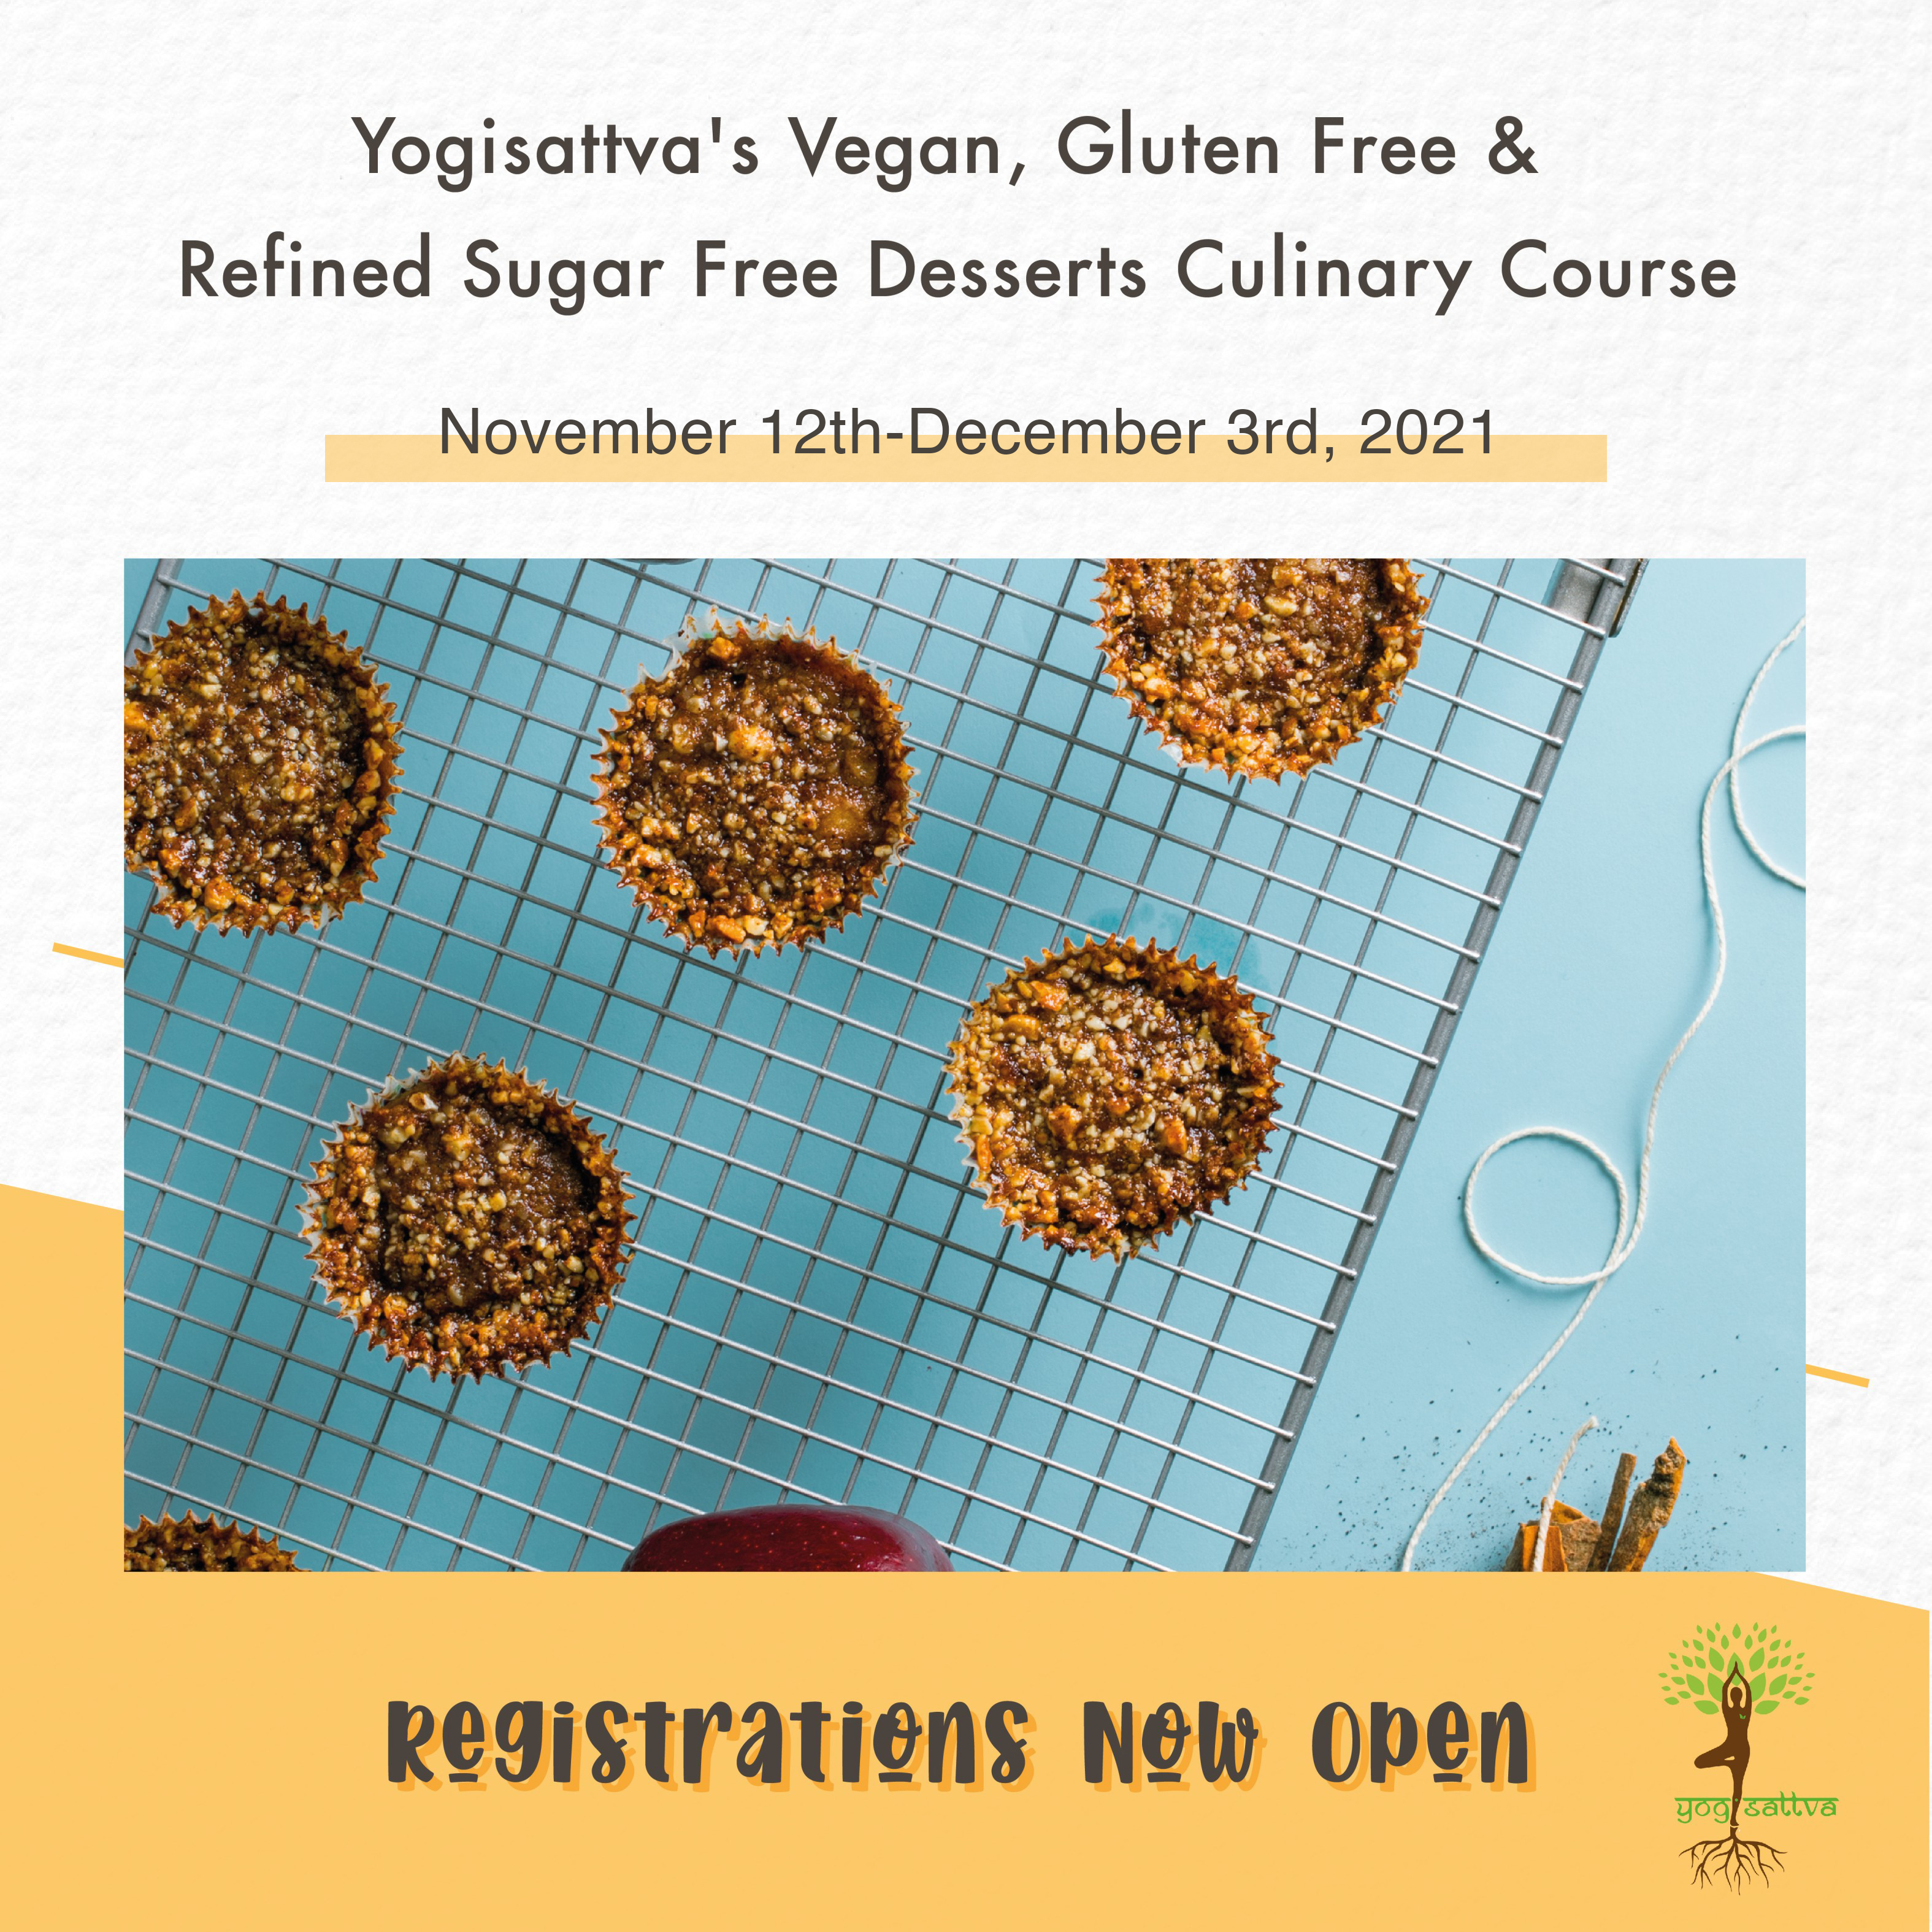 Yogisattva's Vegan, Gluten Free & Refined Sugar Free Desserts Culinary Course (3 week access)